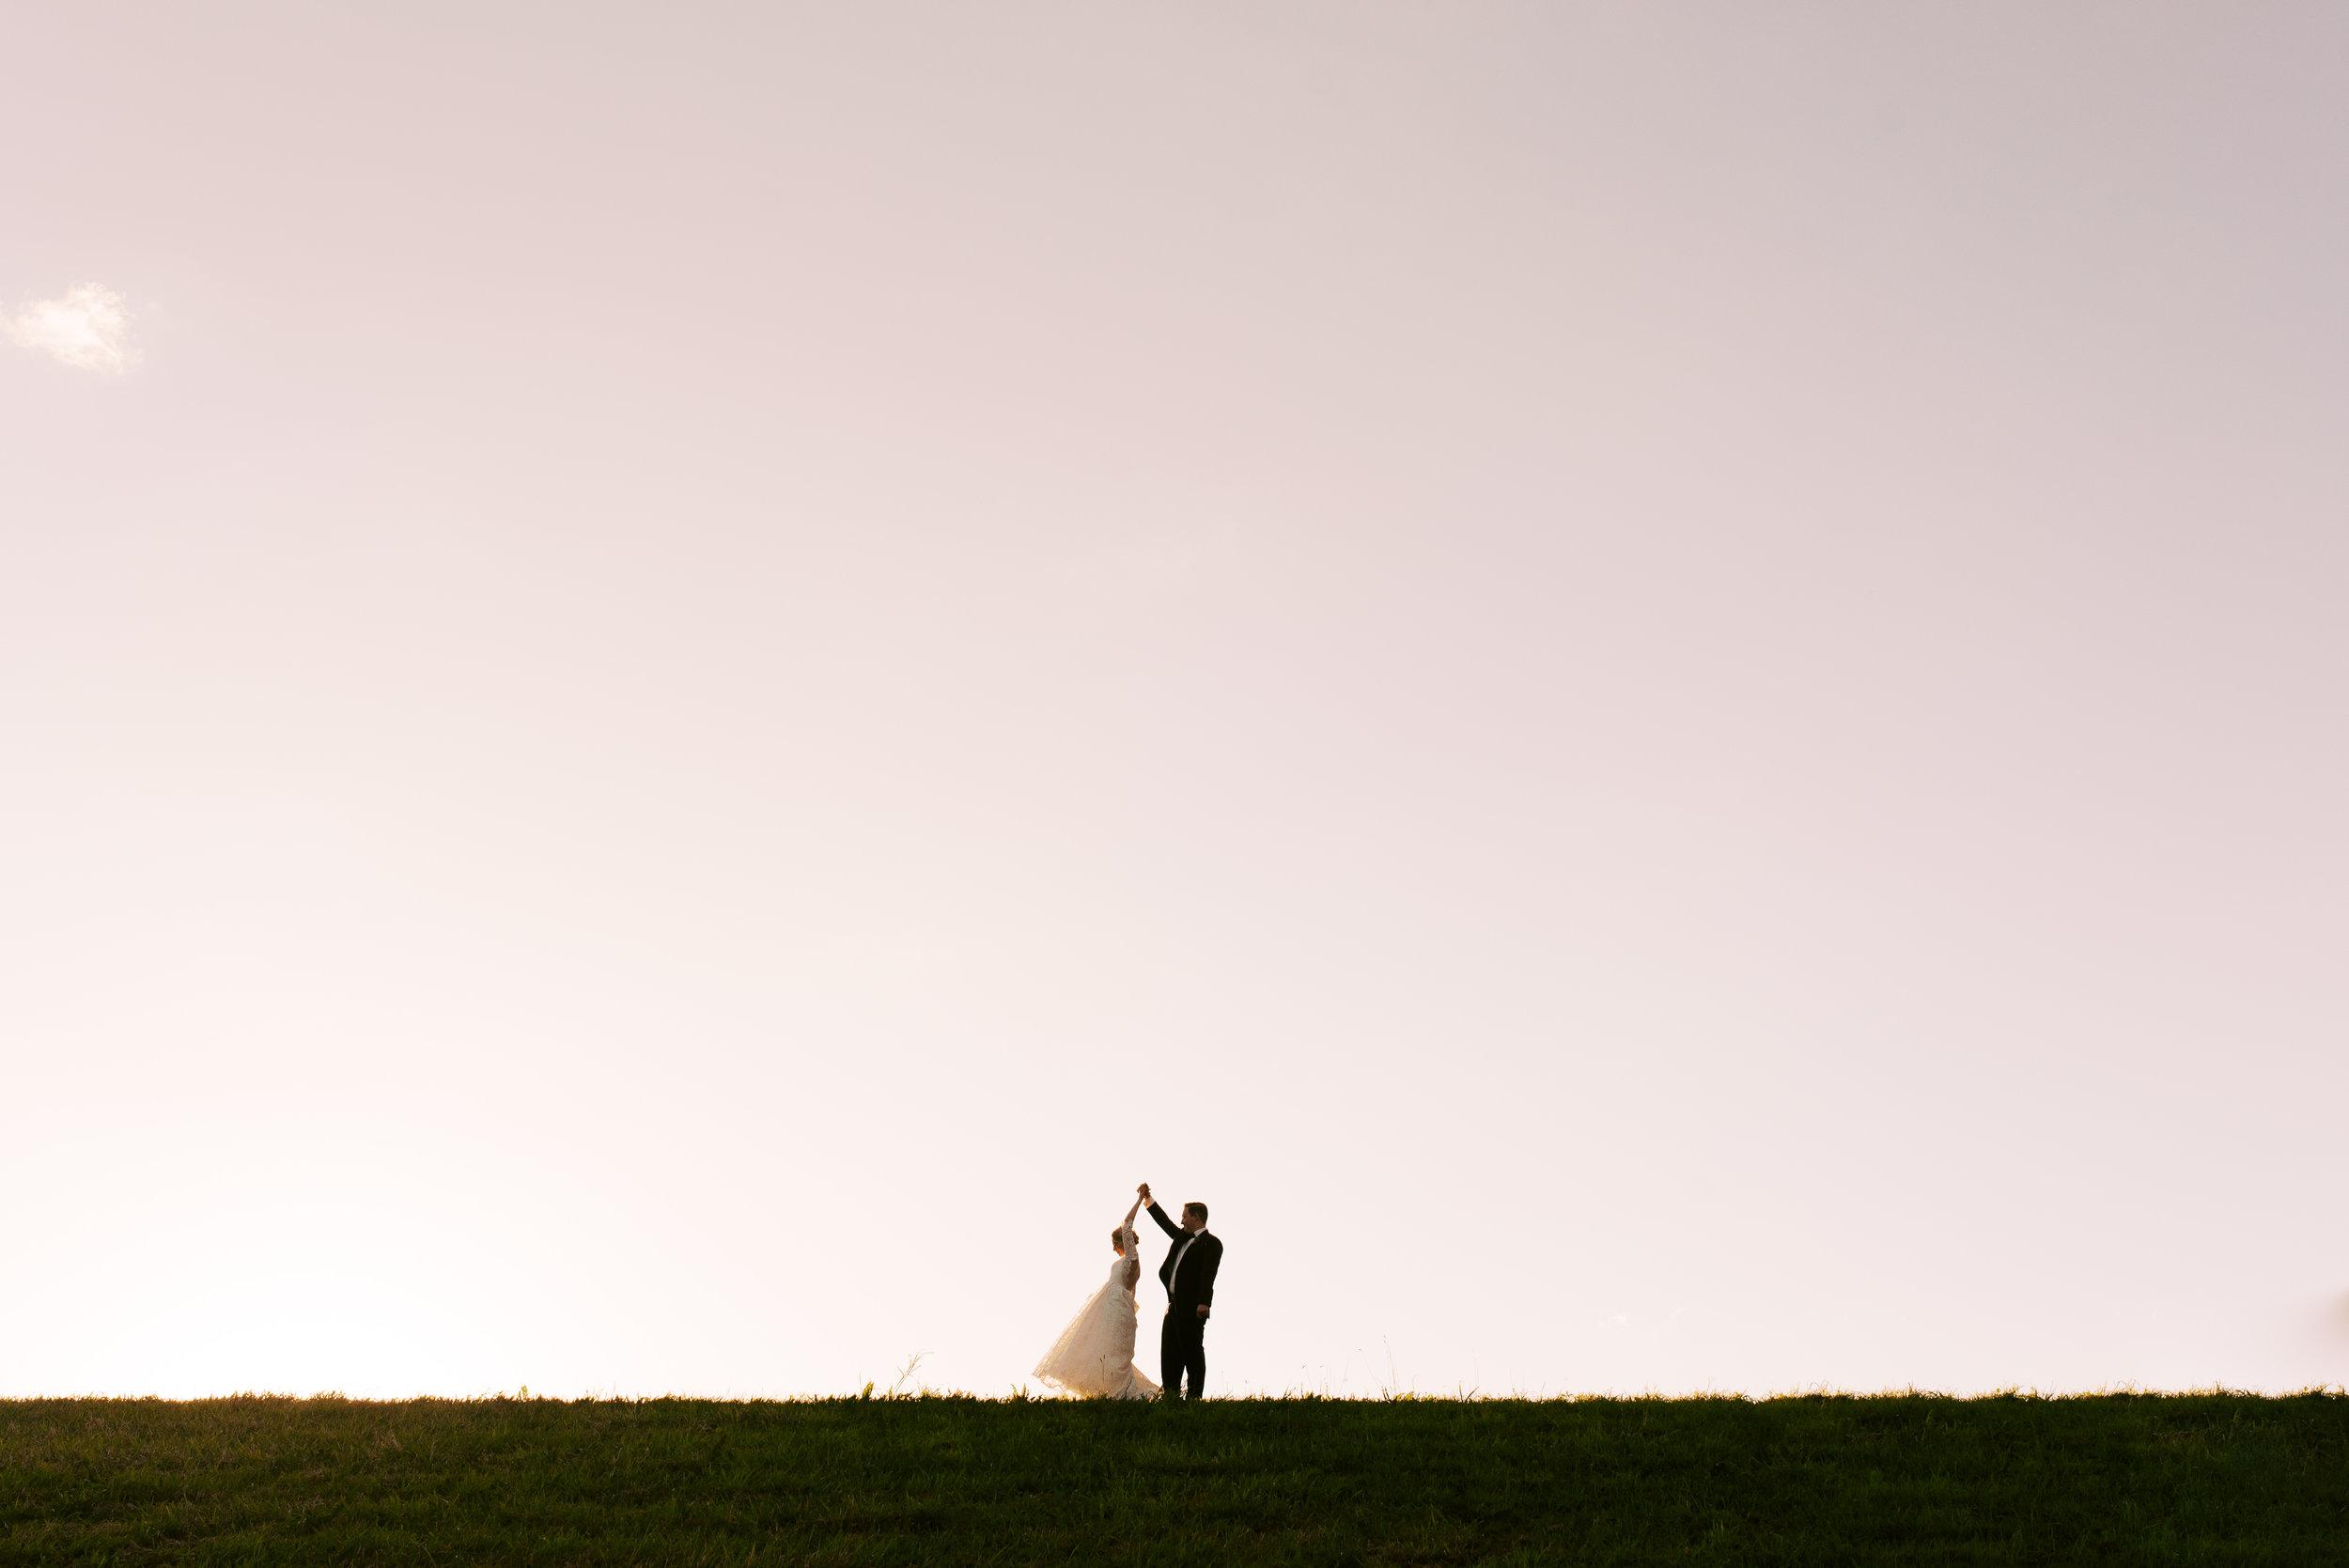 brisbane-gold-coast-sunshine-coast-tweed-romantic-fine-art-wedding-photography-lauren-olivia-47.jpg